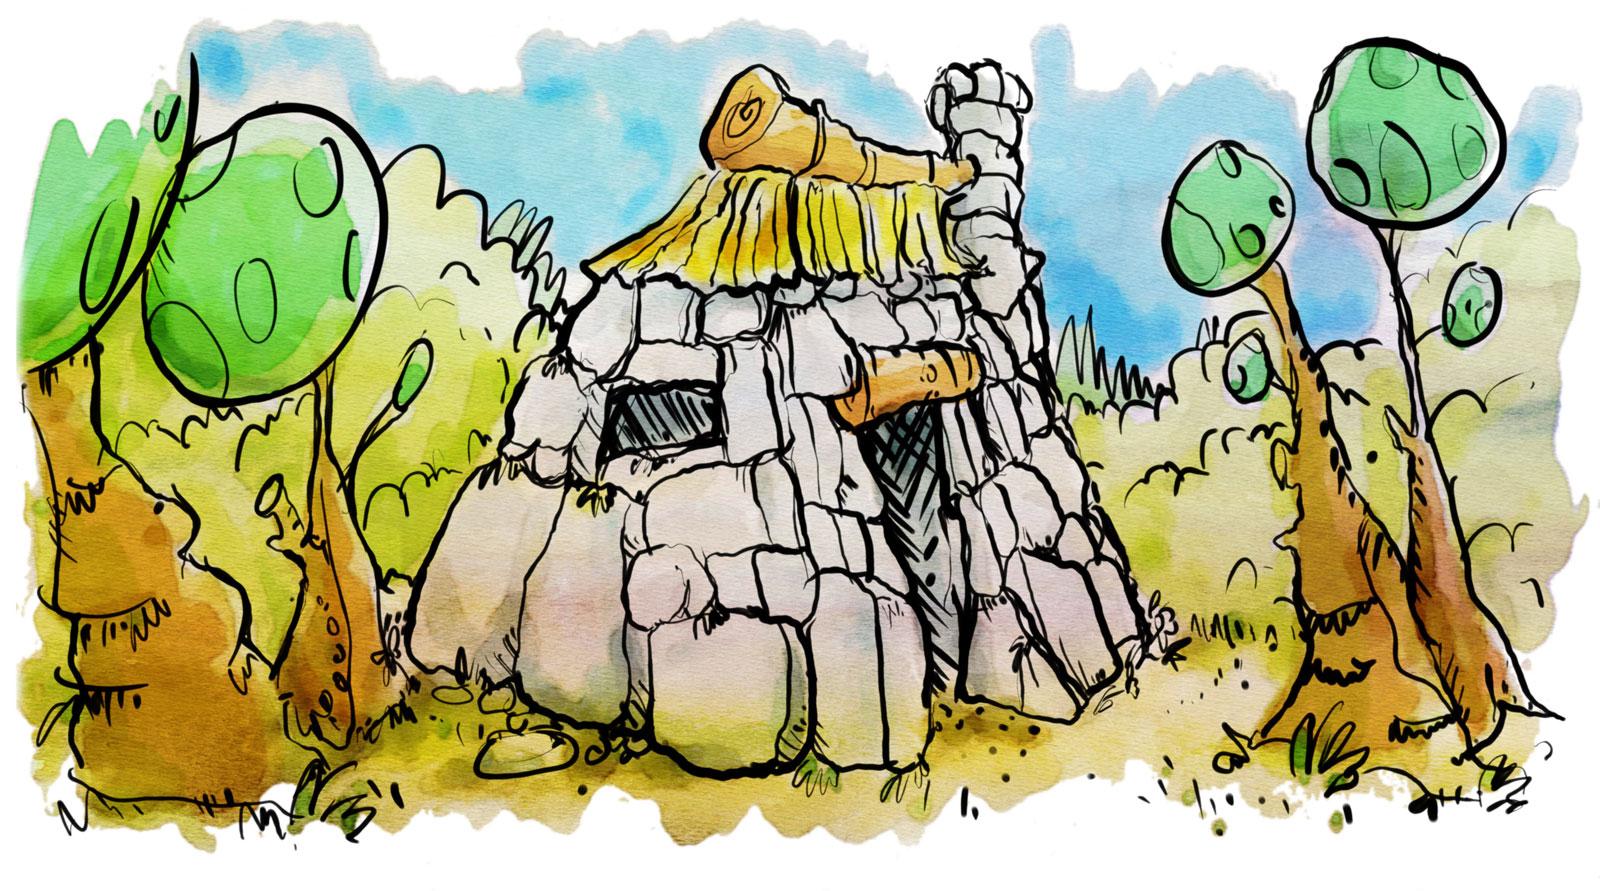 stone house childrens book illustration